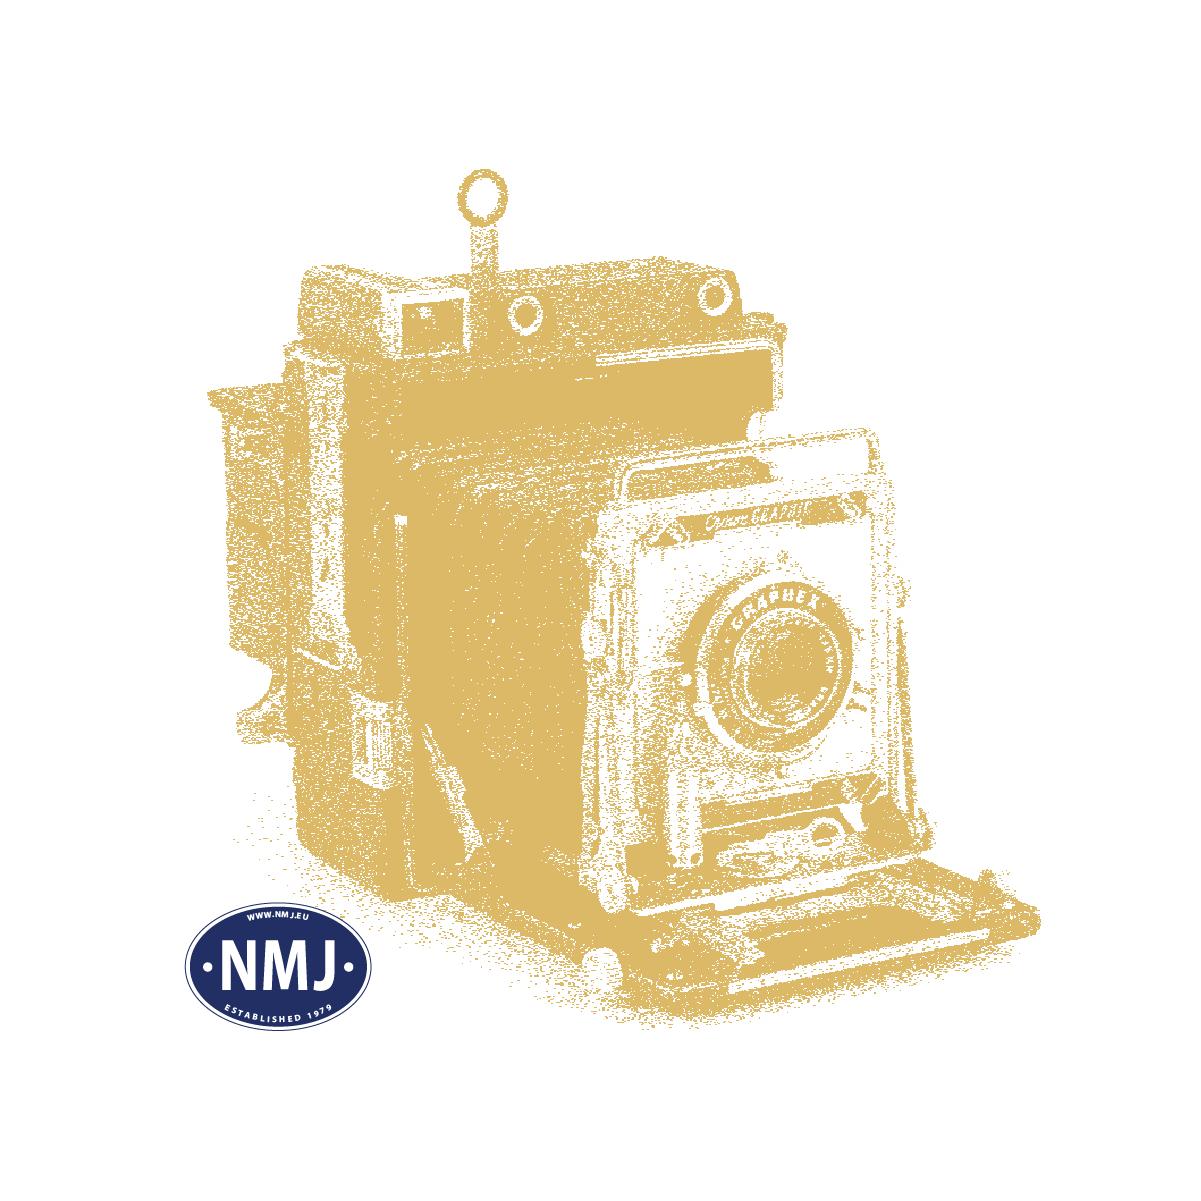 NMJST310962 - NMJ Superline NSB T3 10962 Stakevogn m/ Bremseplattform